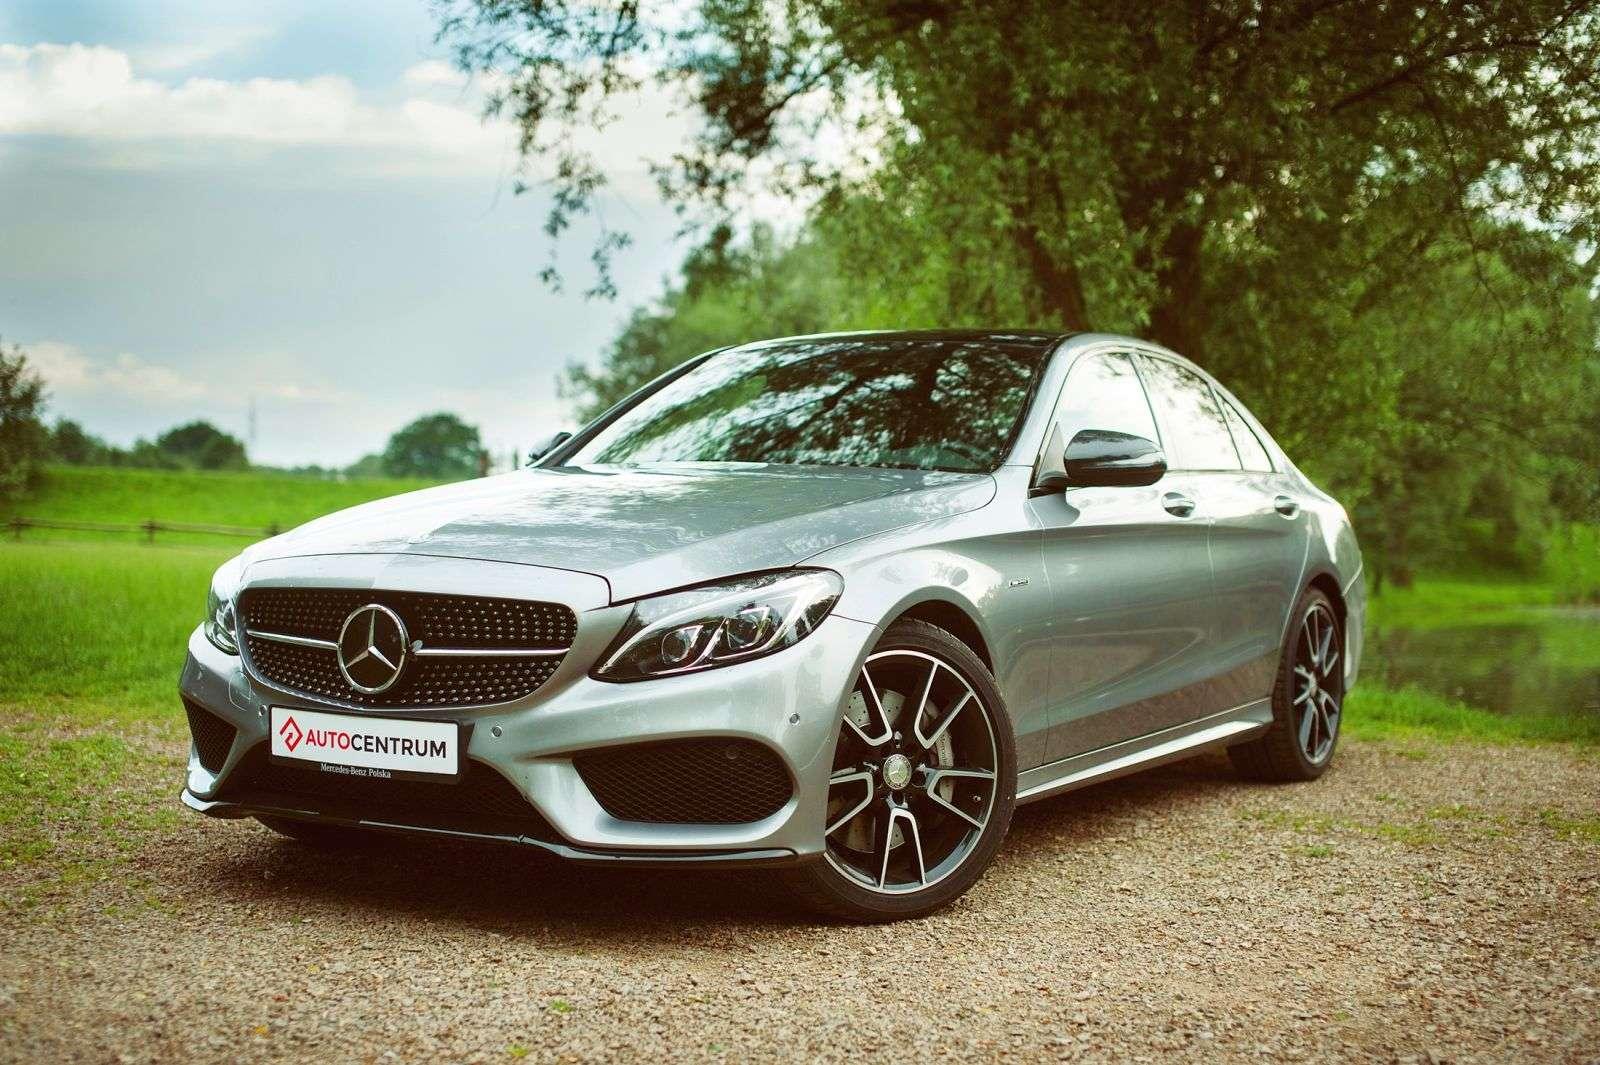 Mercedes benz klasa c 450 amg sport galeria redakcyjna for Benz sport katalog